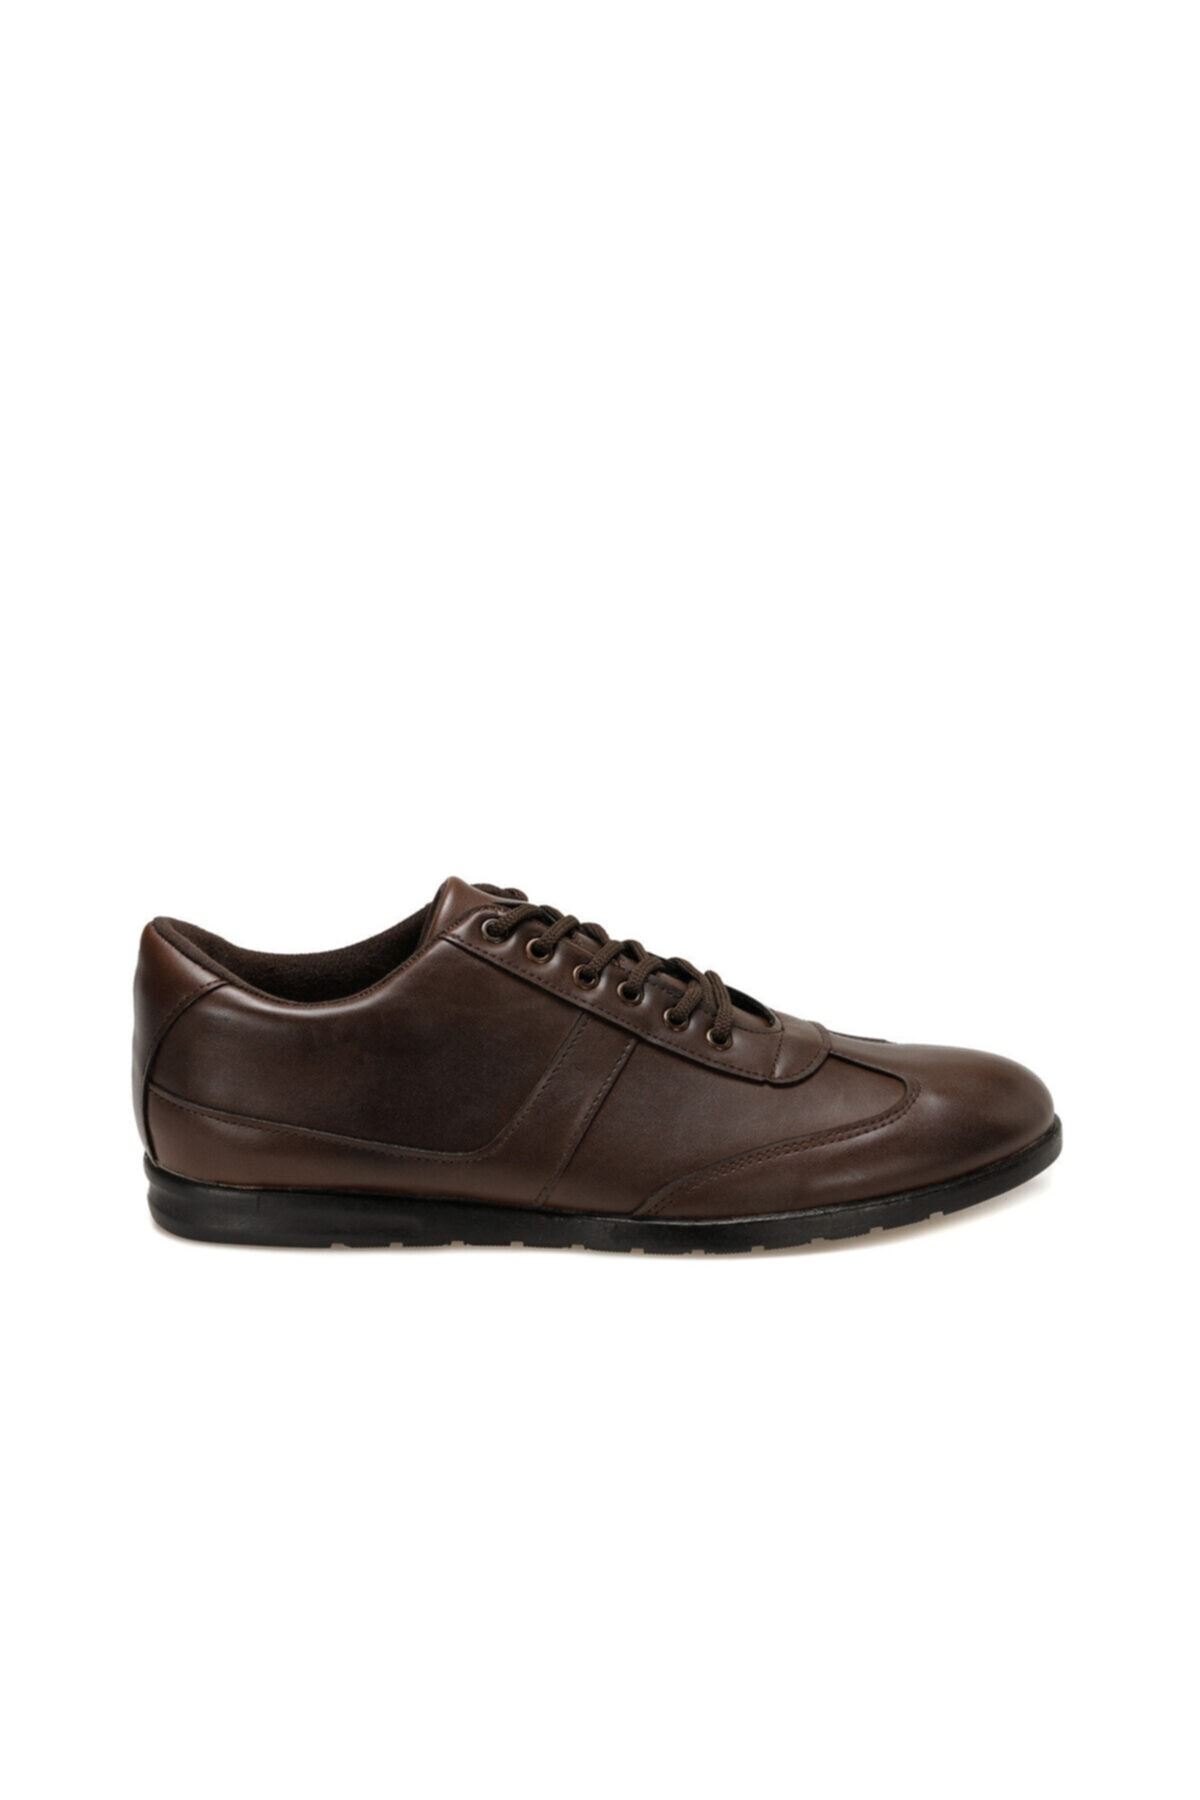 OXIDE GBS118 Kahverengi Erkek Casual Ayakkabı 100521546 2